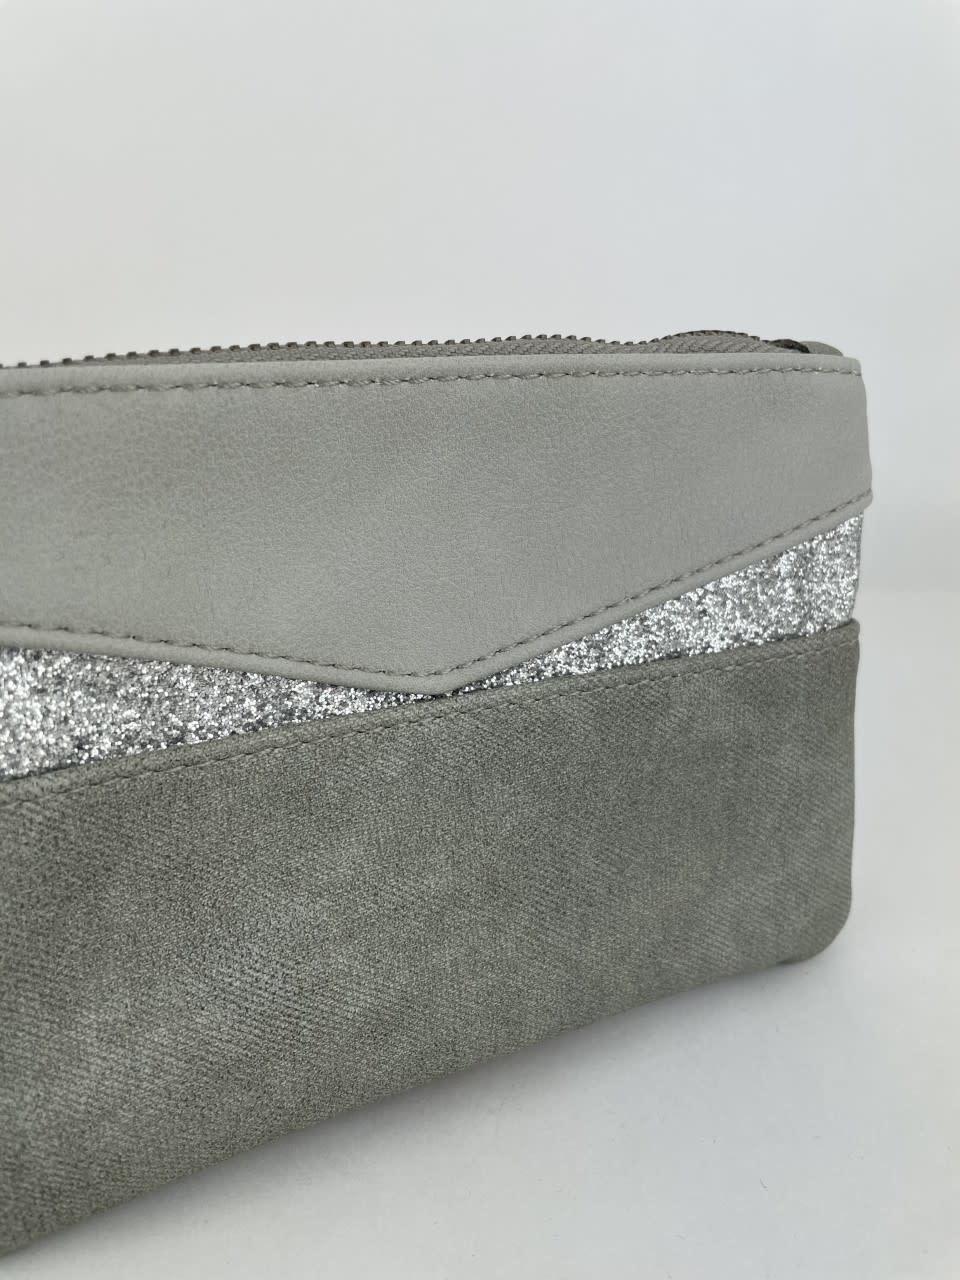 Nalla wallet Grey-2